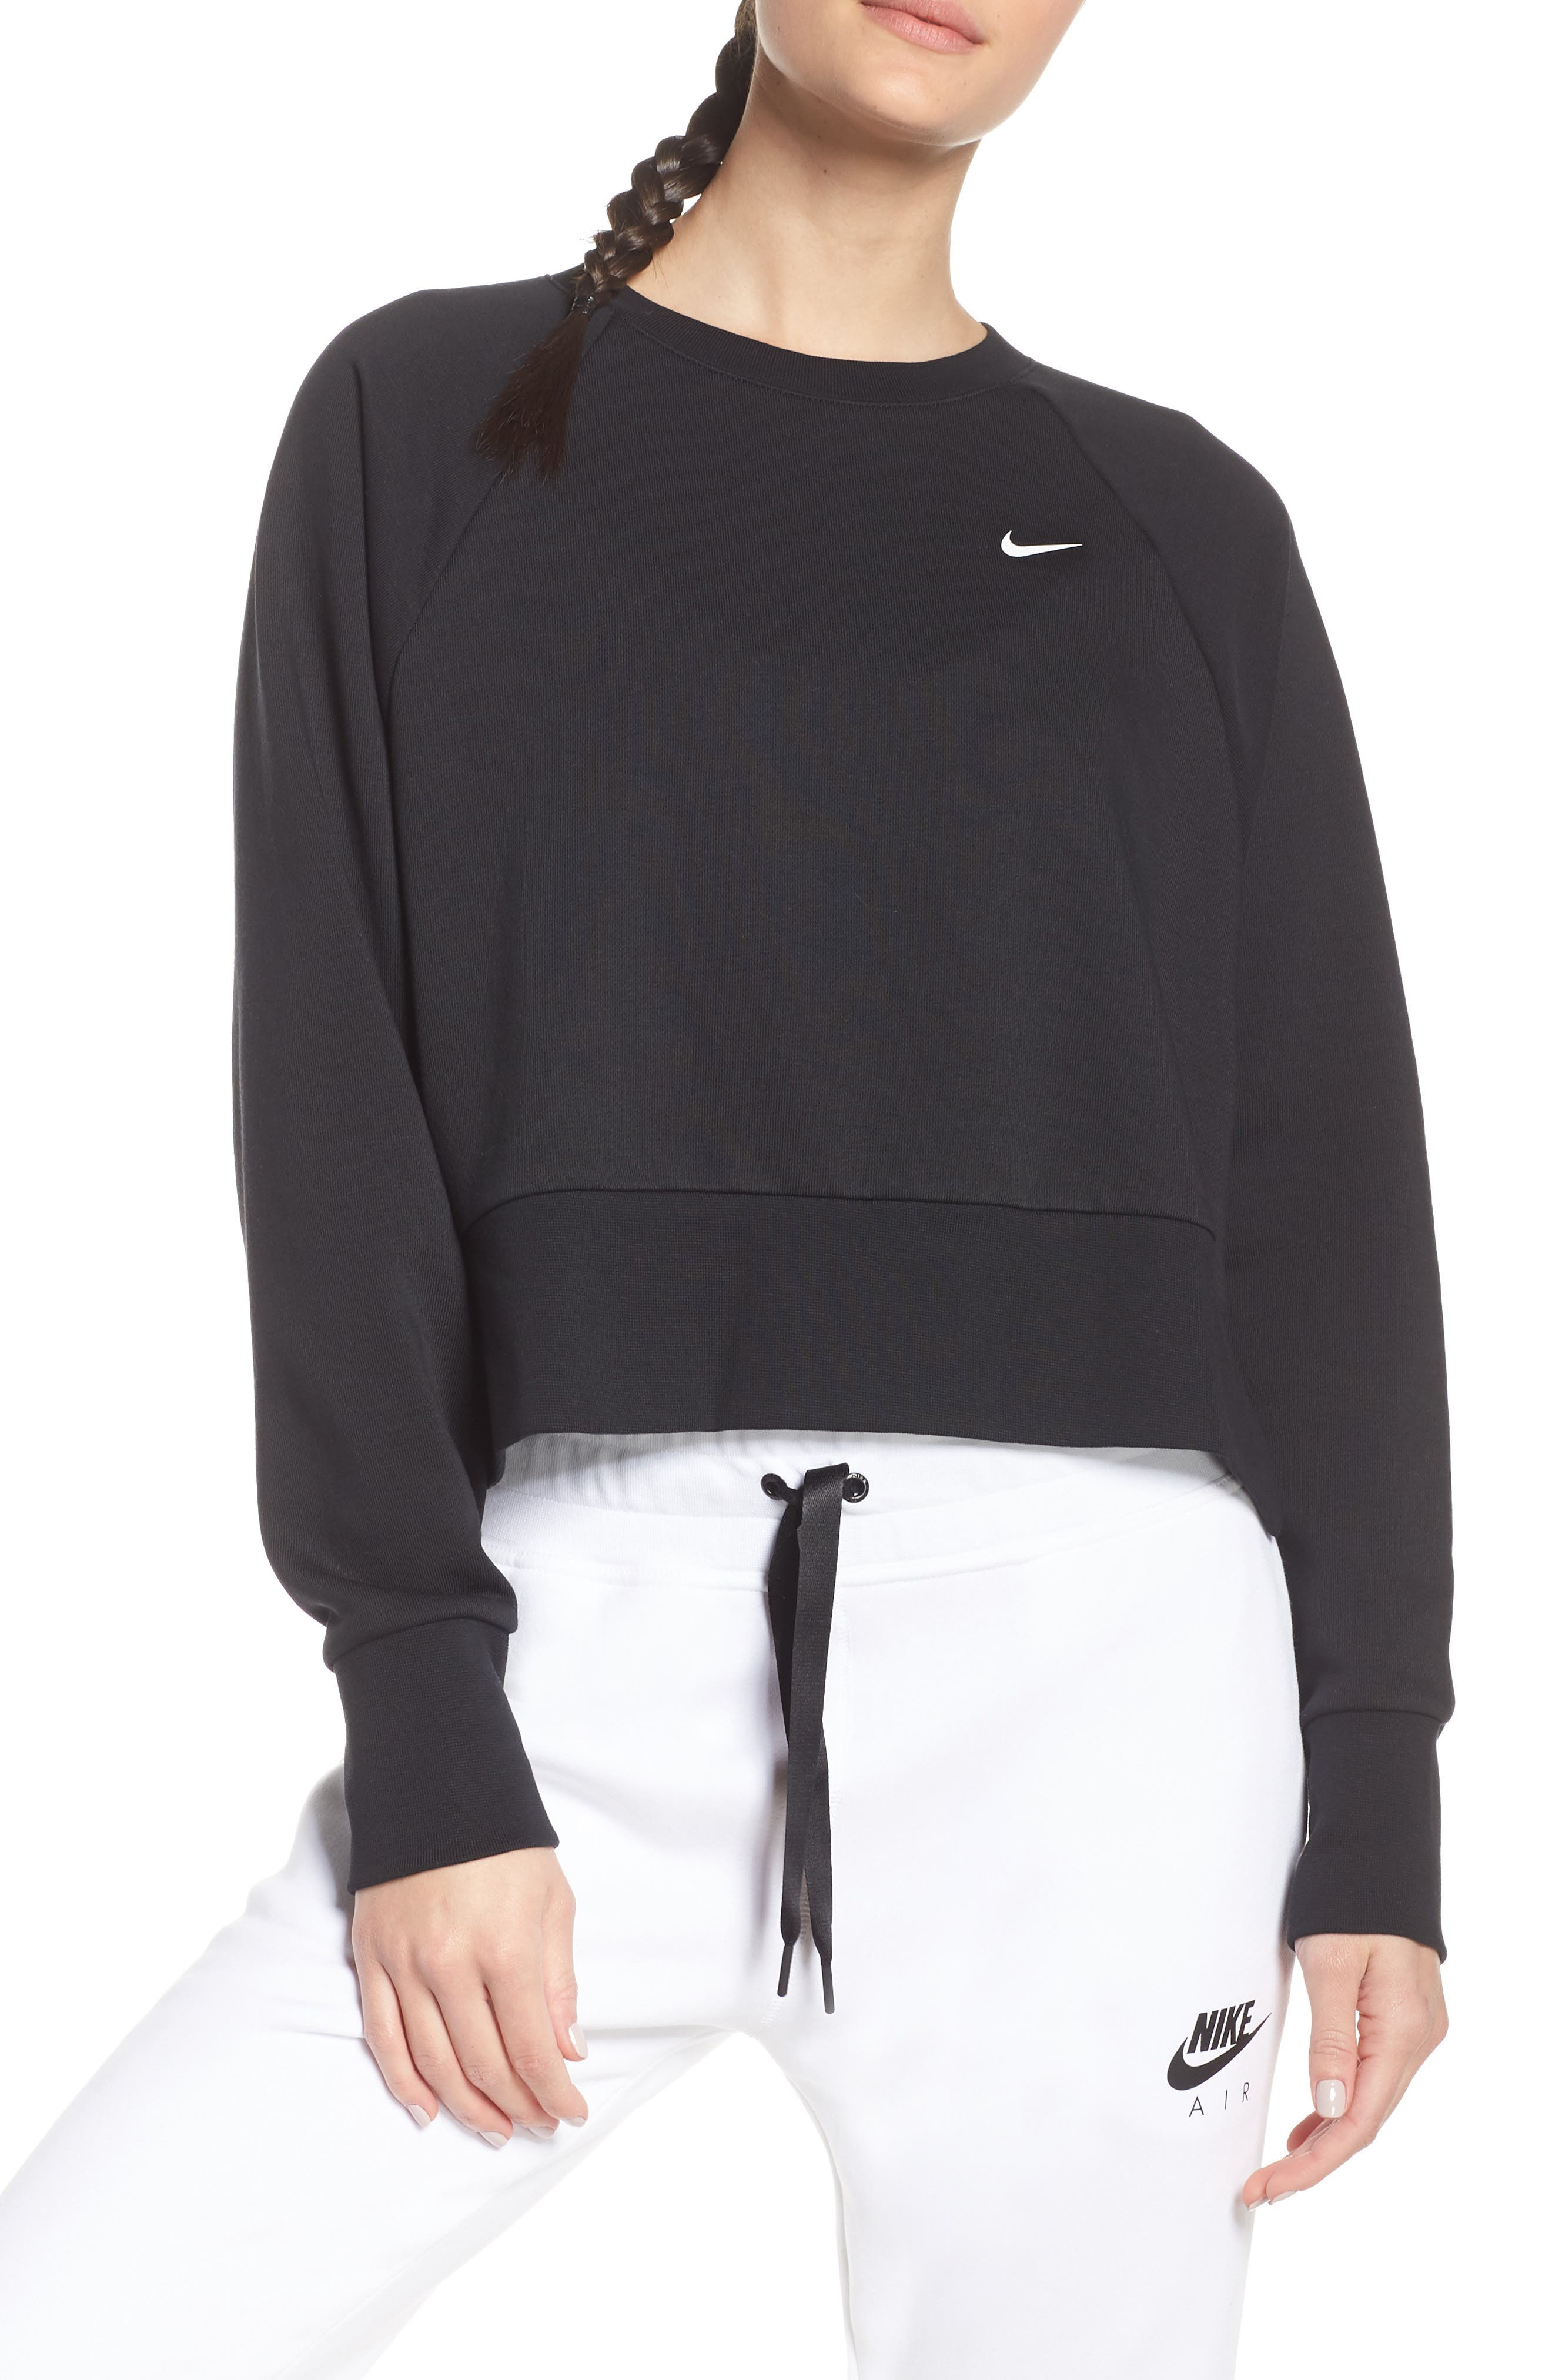 NIKE Dry Crop Training Sweatshirt, Main, color, BLACK/ WHITE